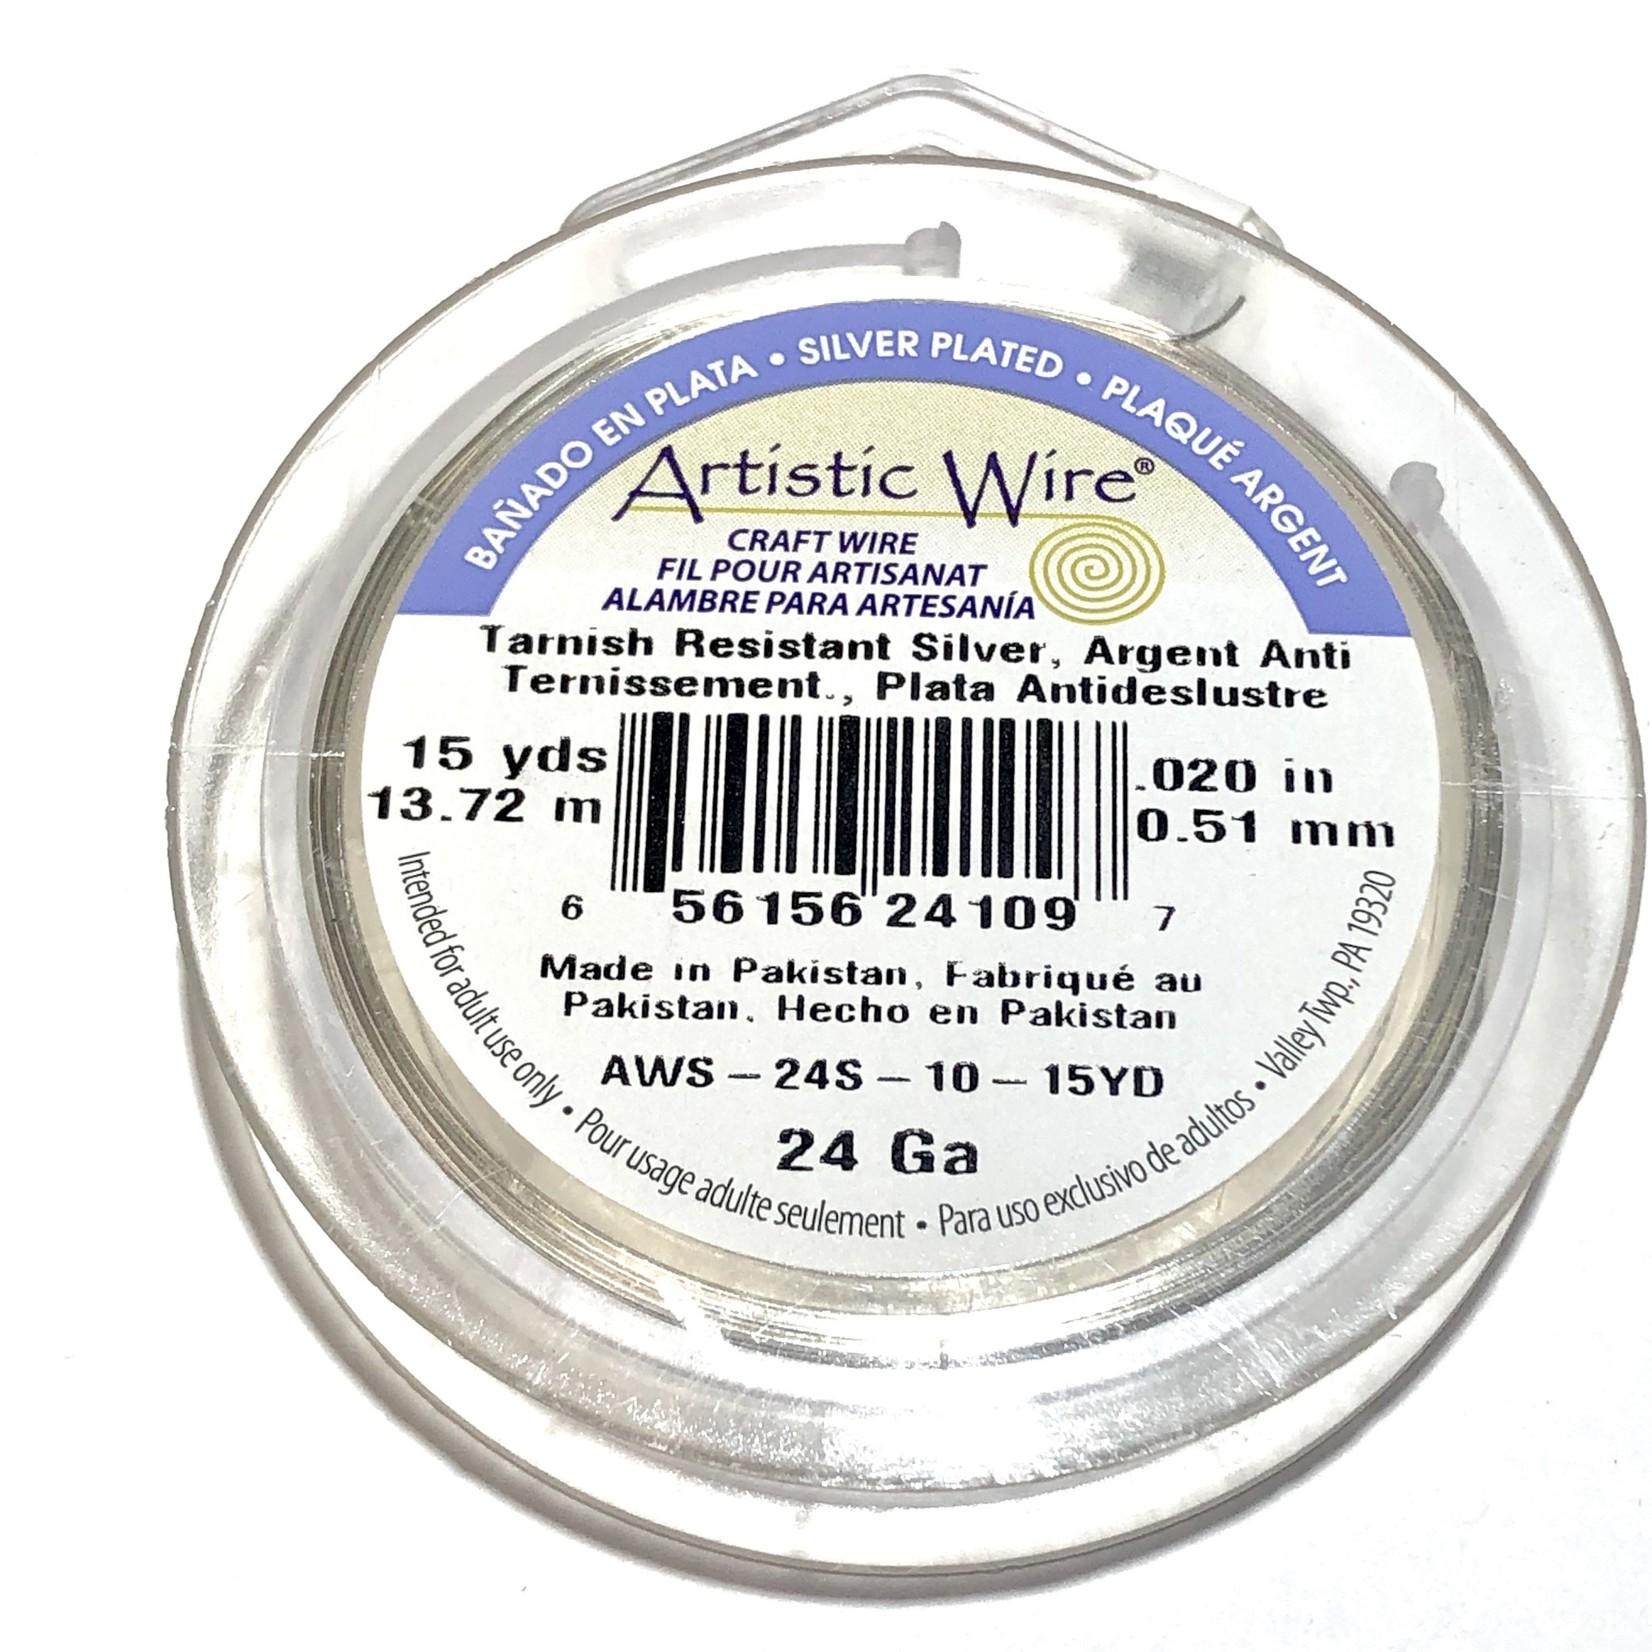 Artistic Wire Tarnish Resistant Silver 24Ga 15Yd